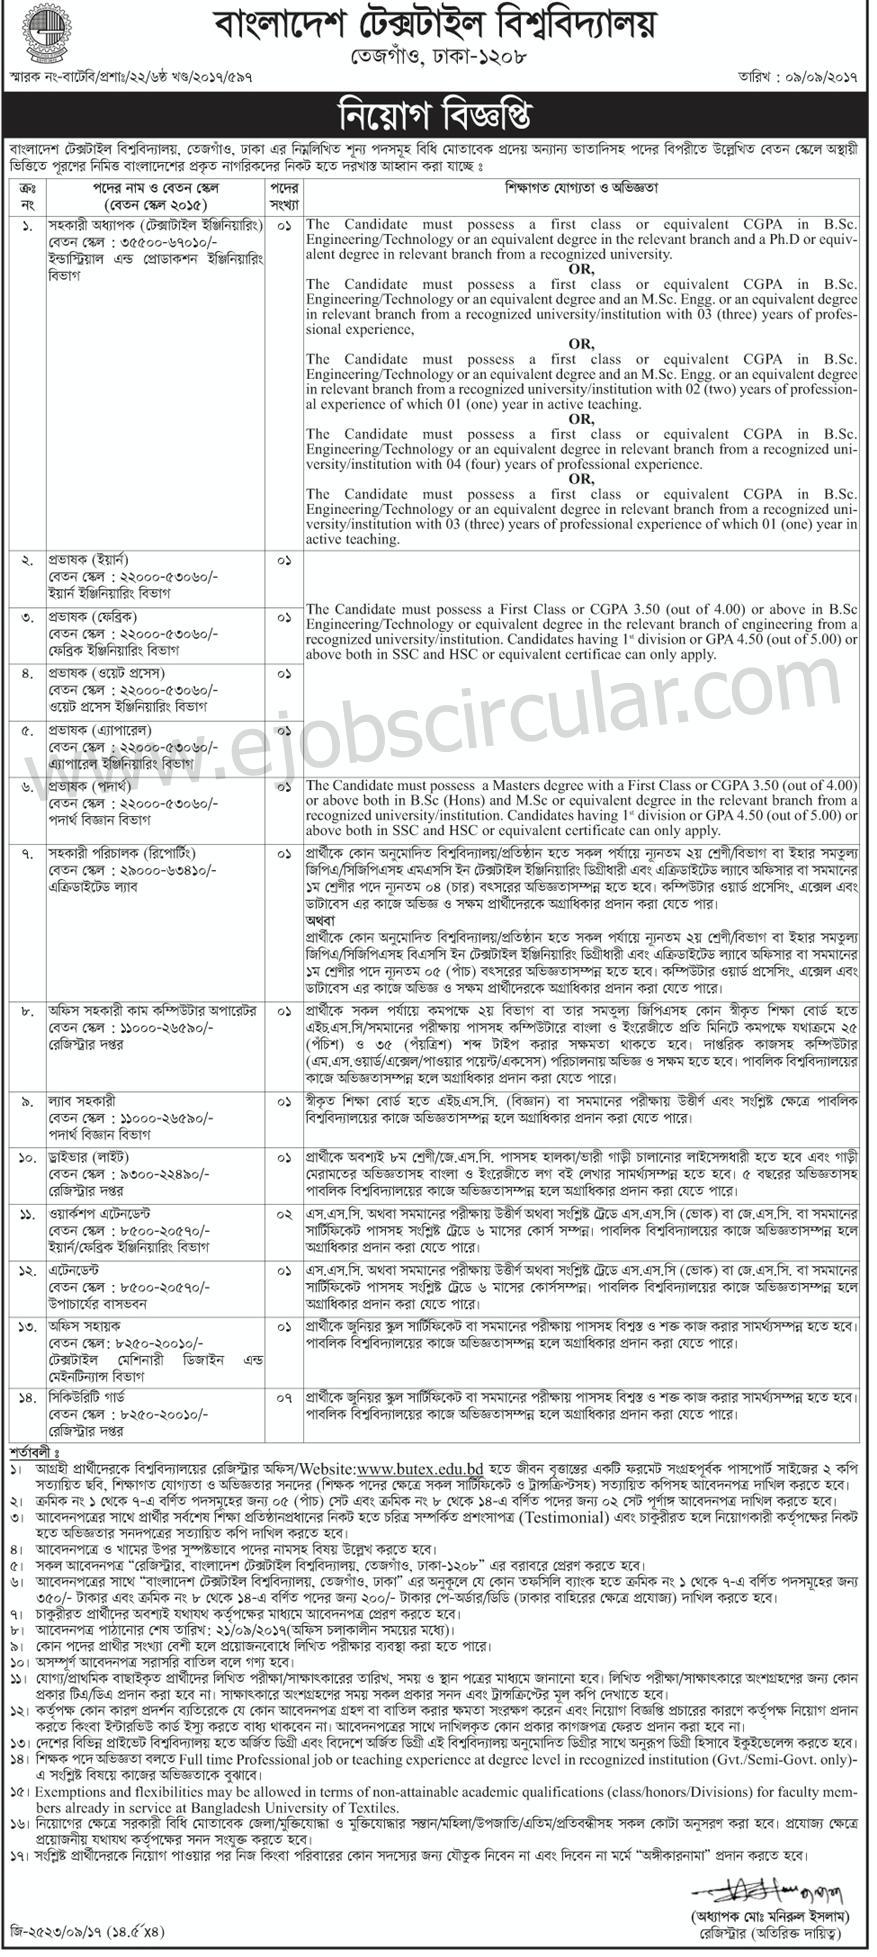 Bangladesh Taxtiles University BUTEX Job Circular 2017